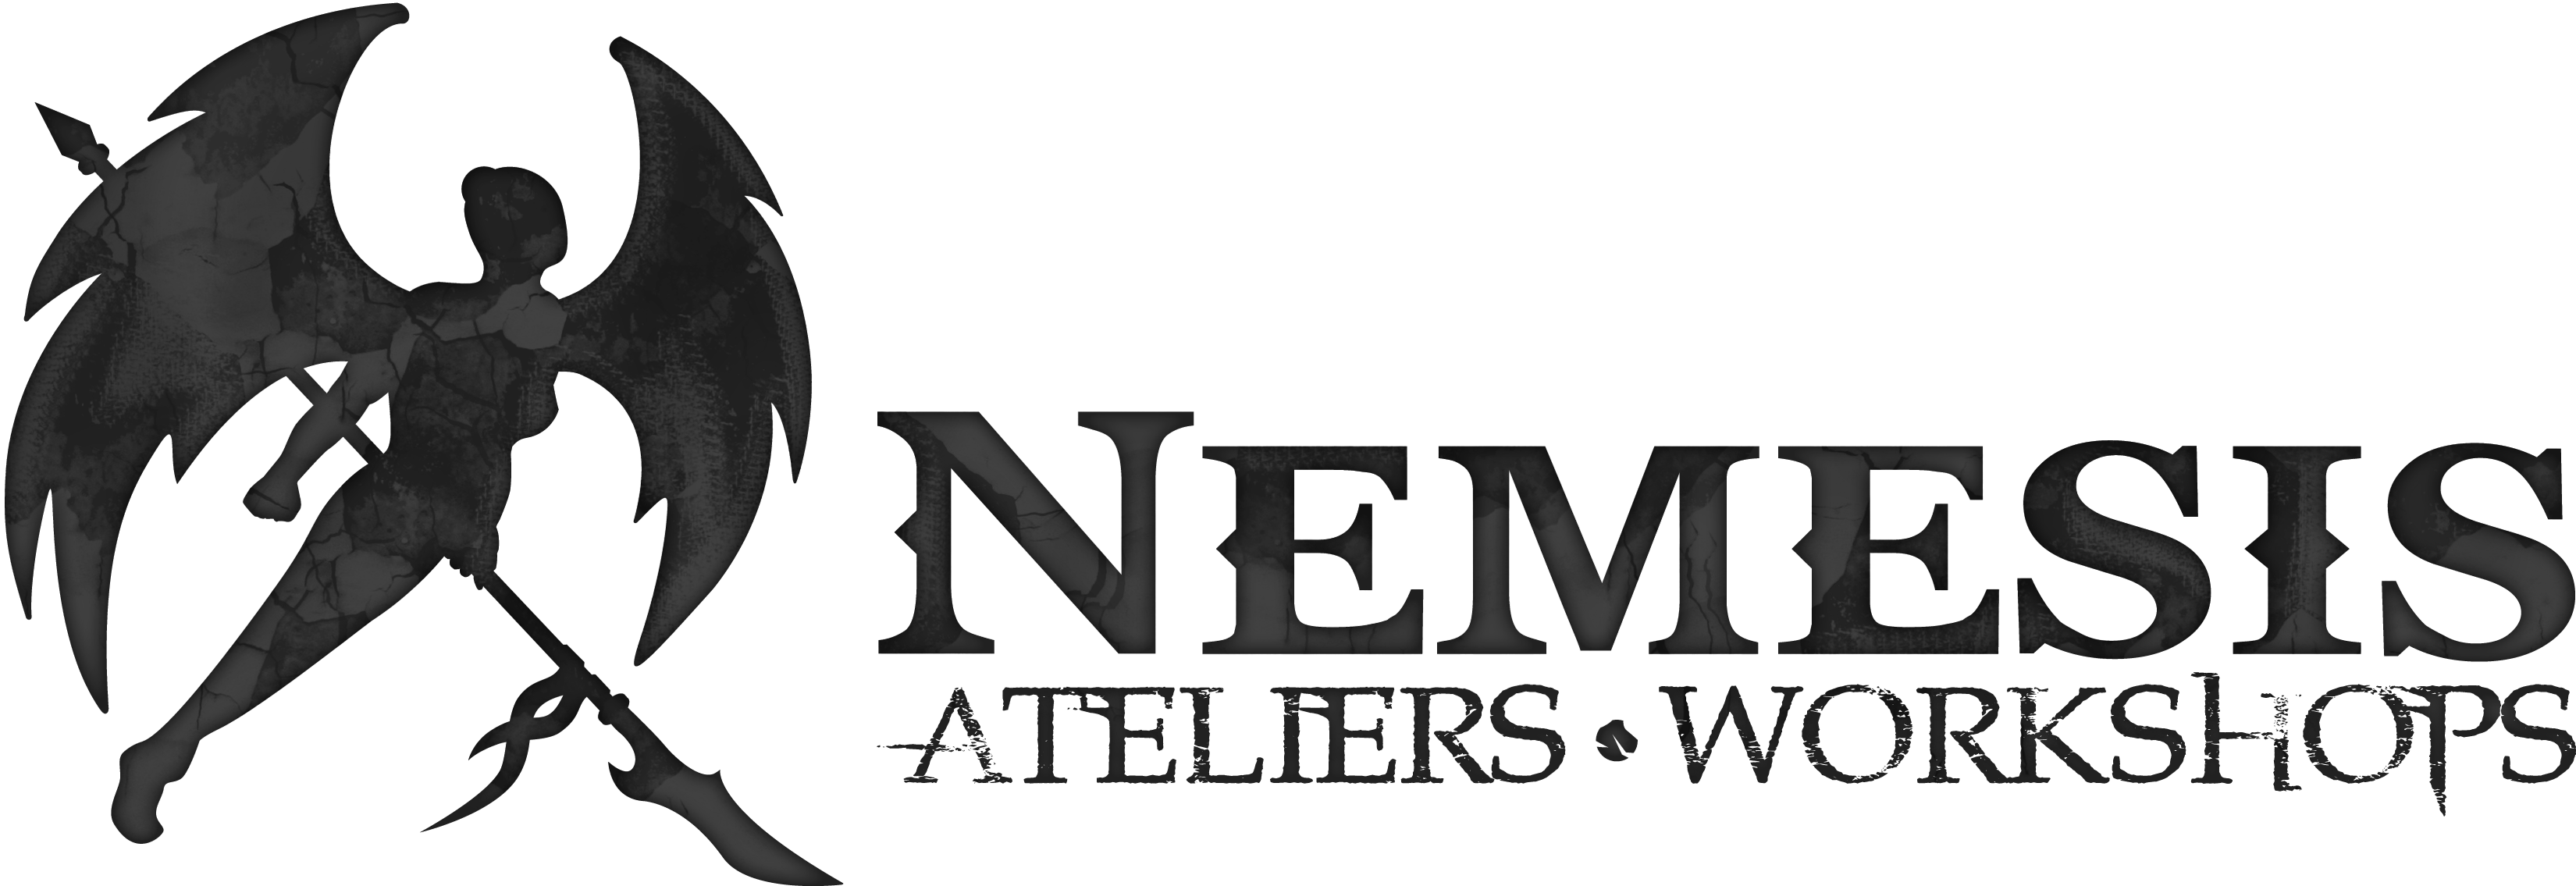 Ateliers Nemesis Inc